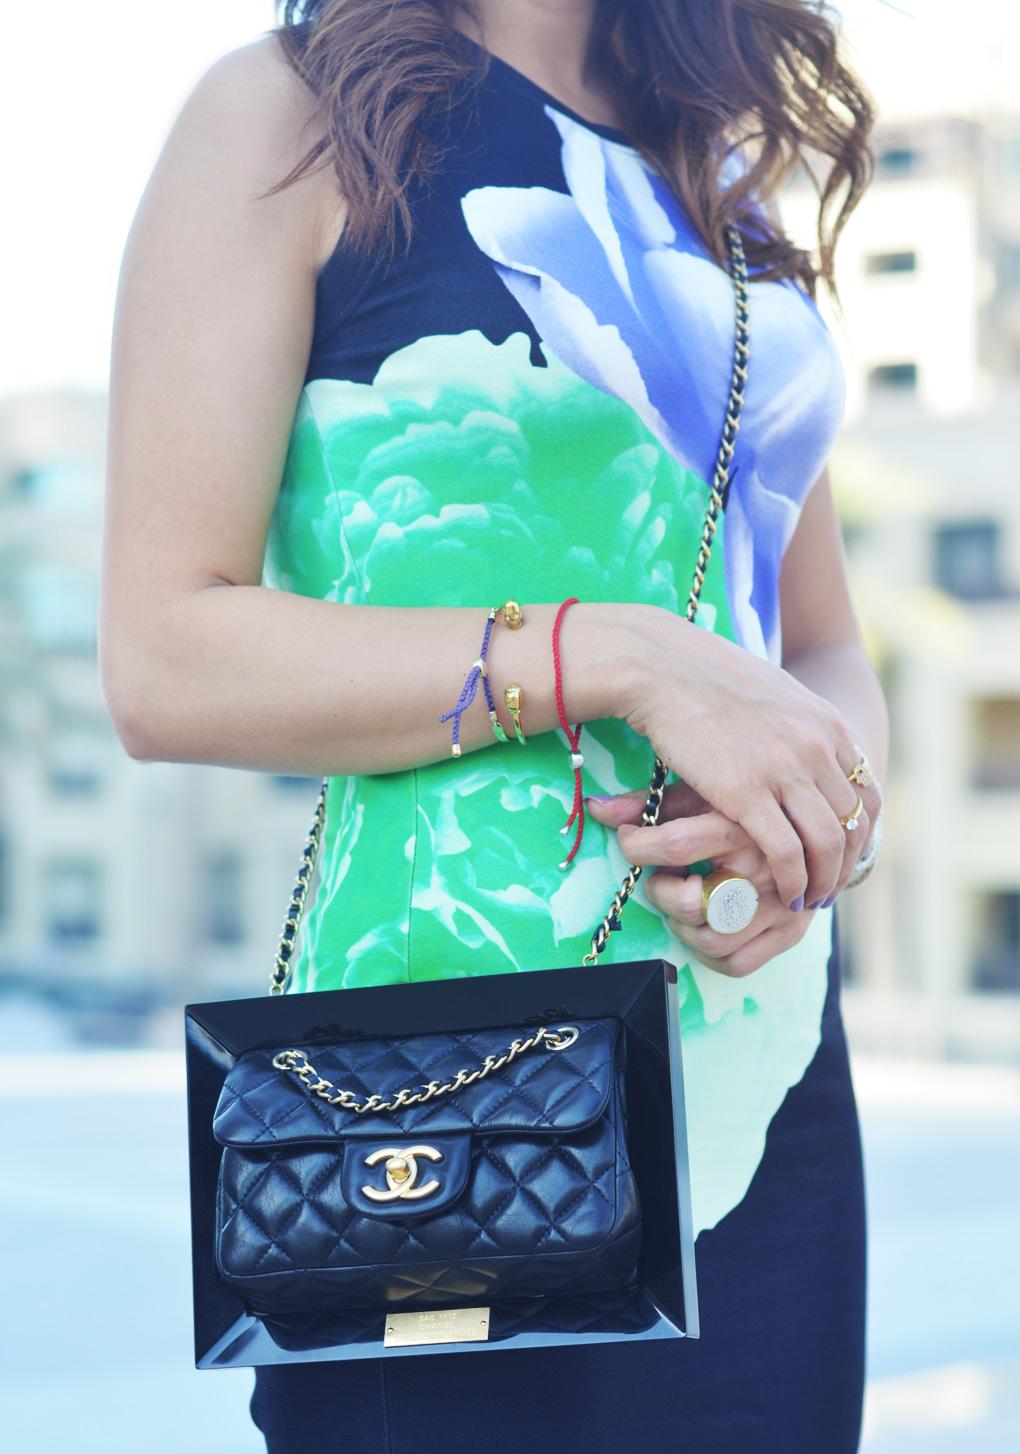 Lyla_Loves_Fashion_Chanel_SS14_Jonathan_Saunders_Christian_Louboutin_0040